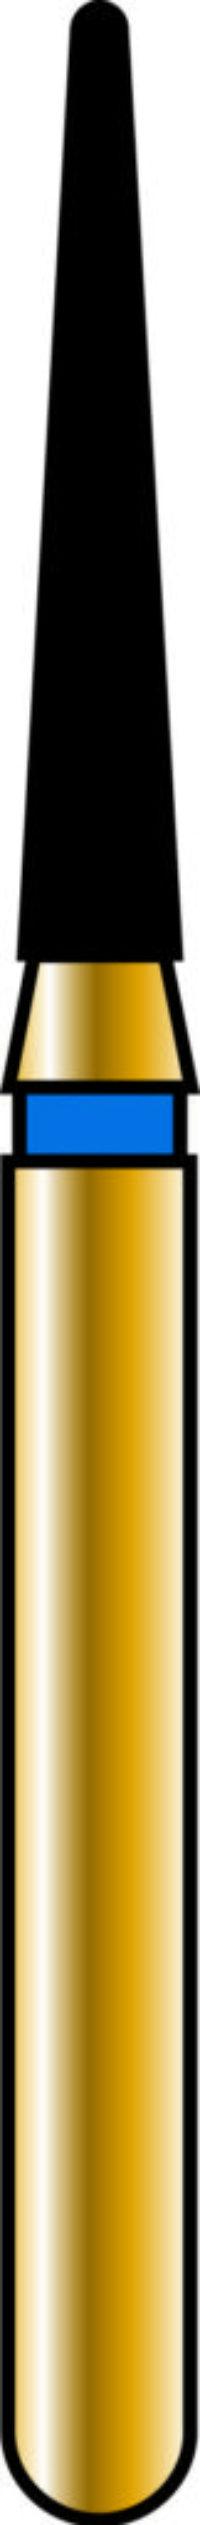 Round End Taper 14-8mm Gold Diamond Bur